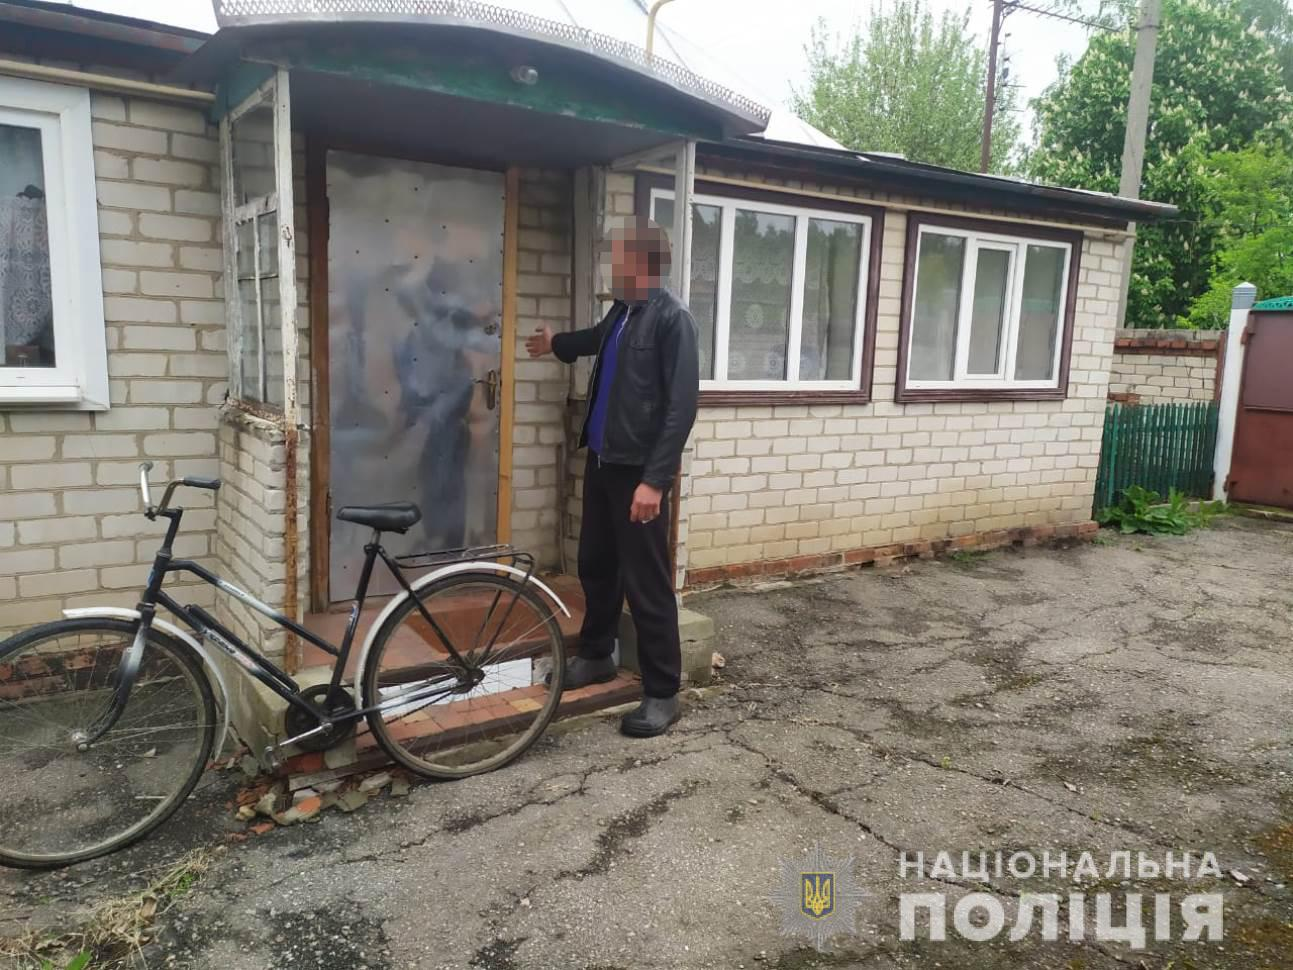 Под Харьковом пойман вор-рецидивист, обчищавший дачи. Новости Харькова